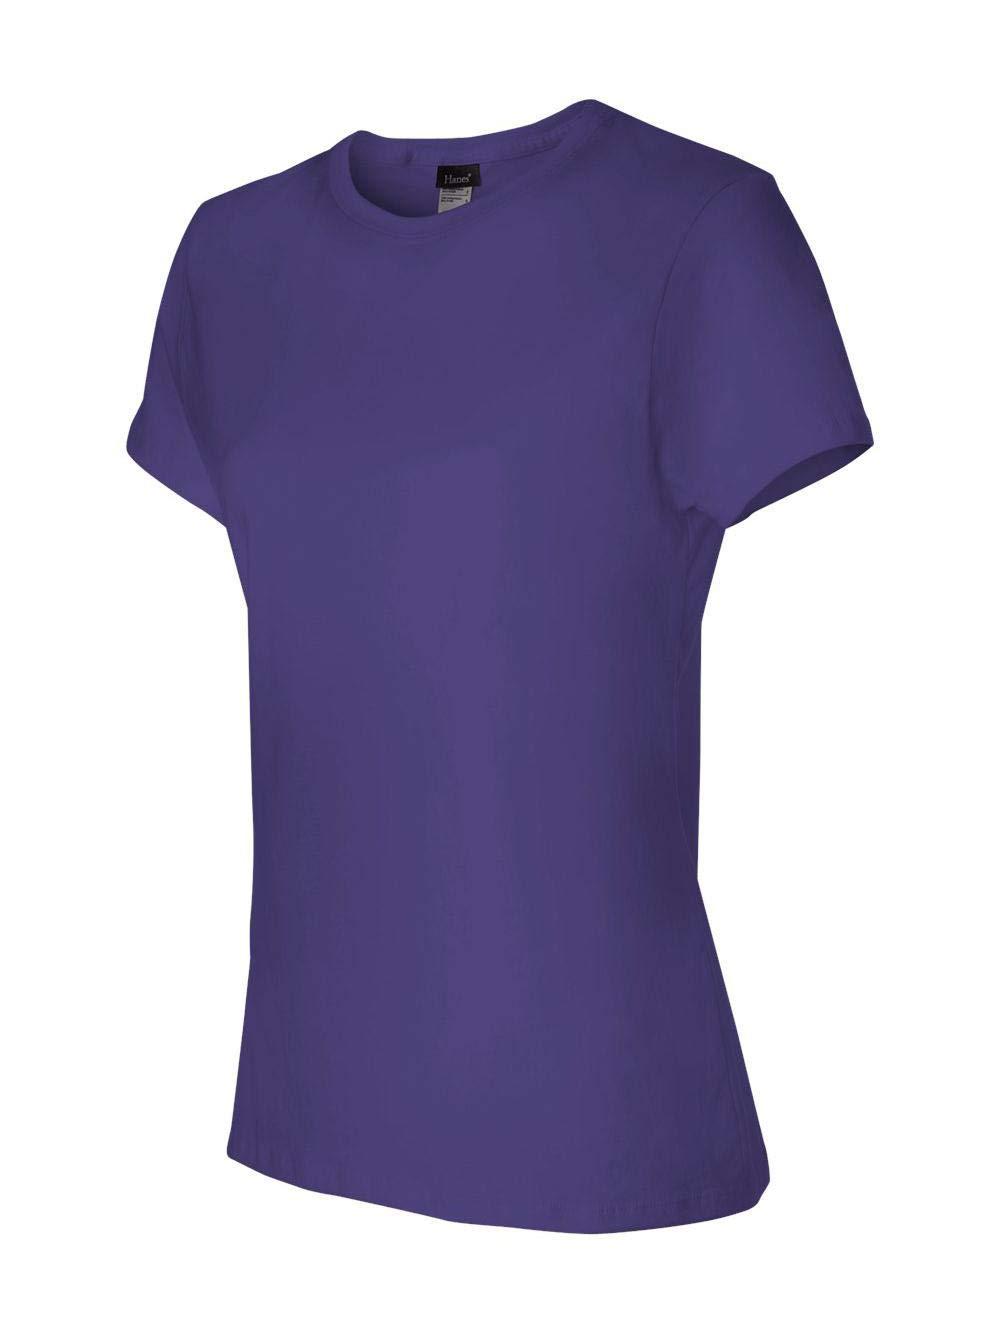 Hanes 4.5 oz Women's NANO-T Lightweight Premium T-Shirt - Purple - L